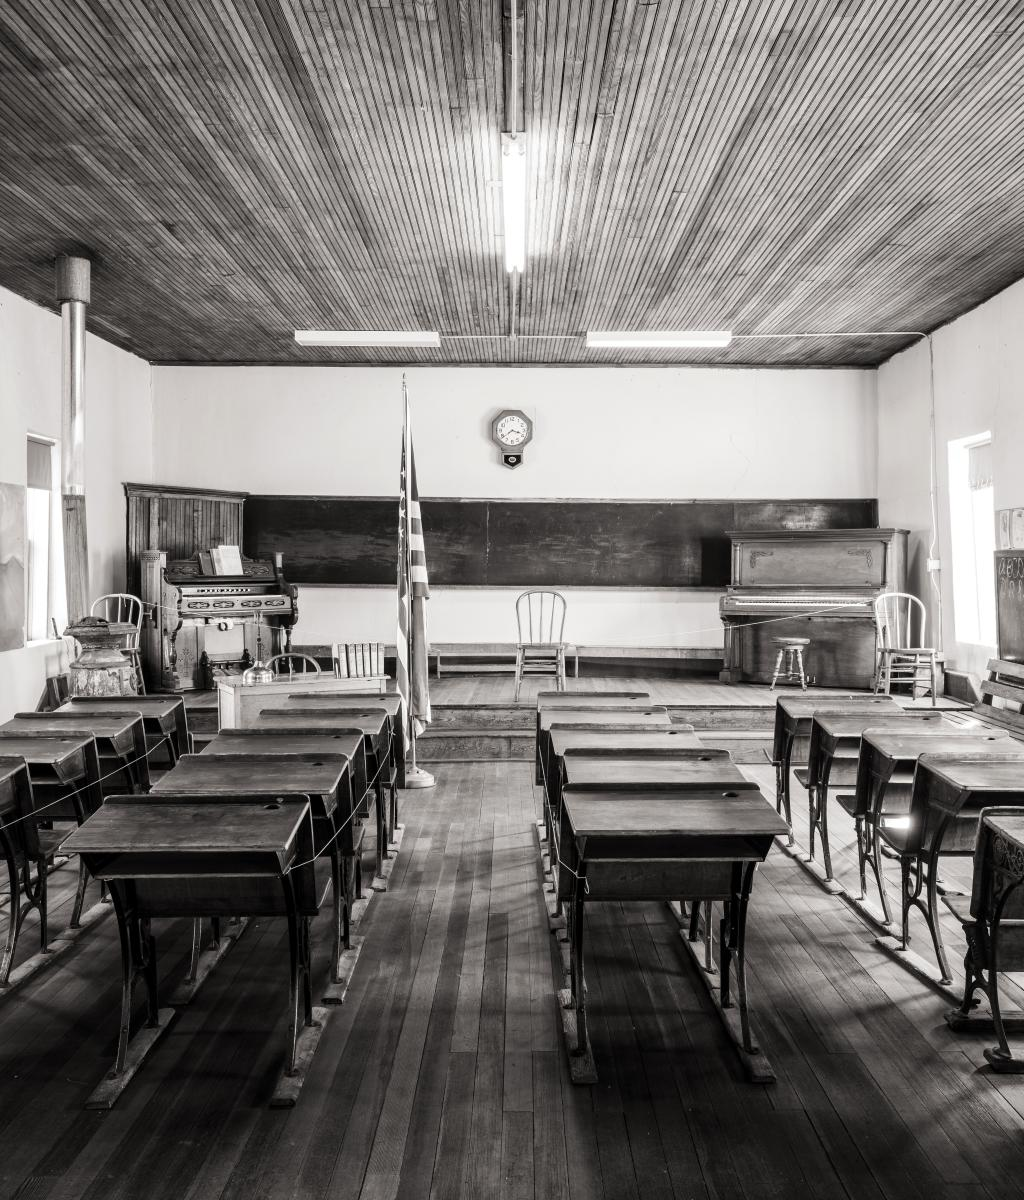 Kingston's schoolhouse turned museum